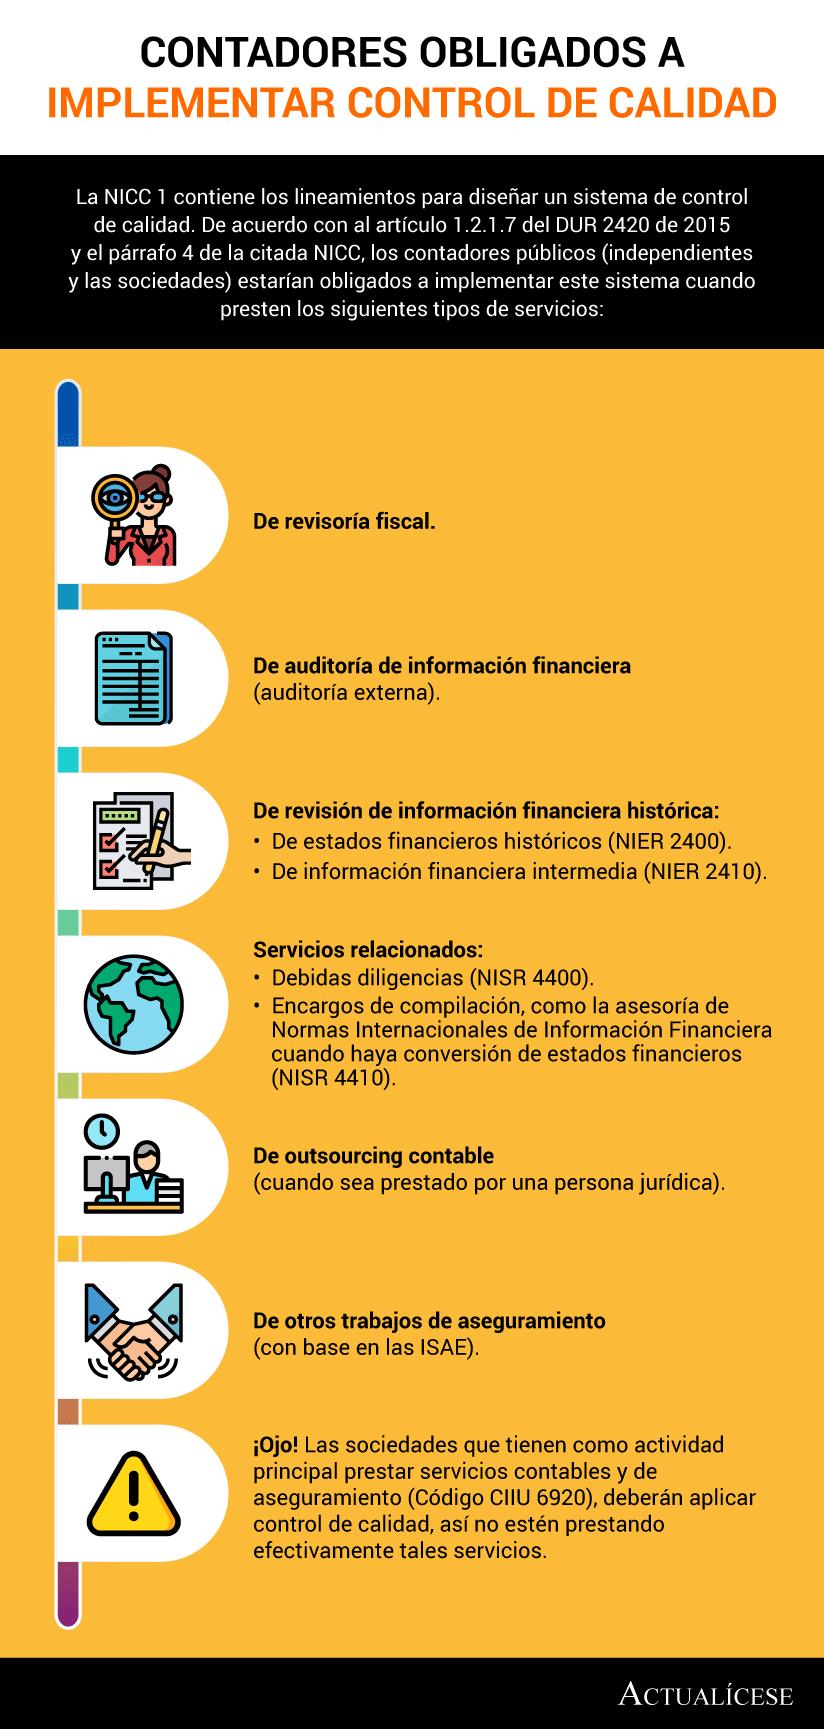 [Infografía] Contadores obligados a implementar control de calidad